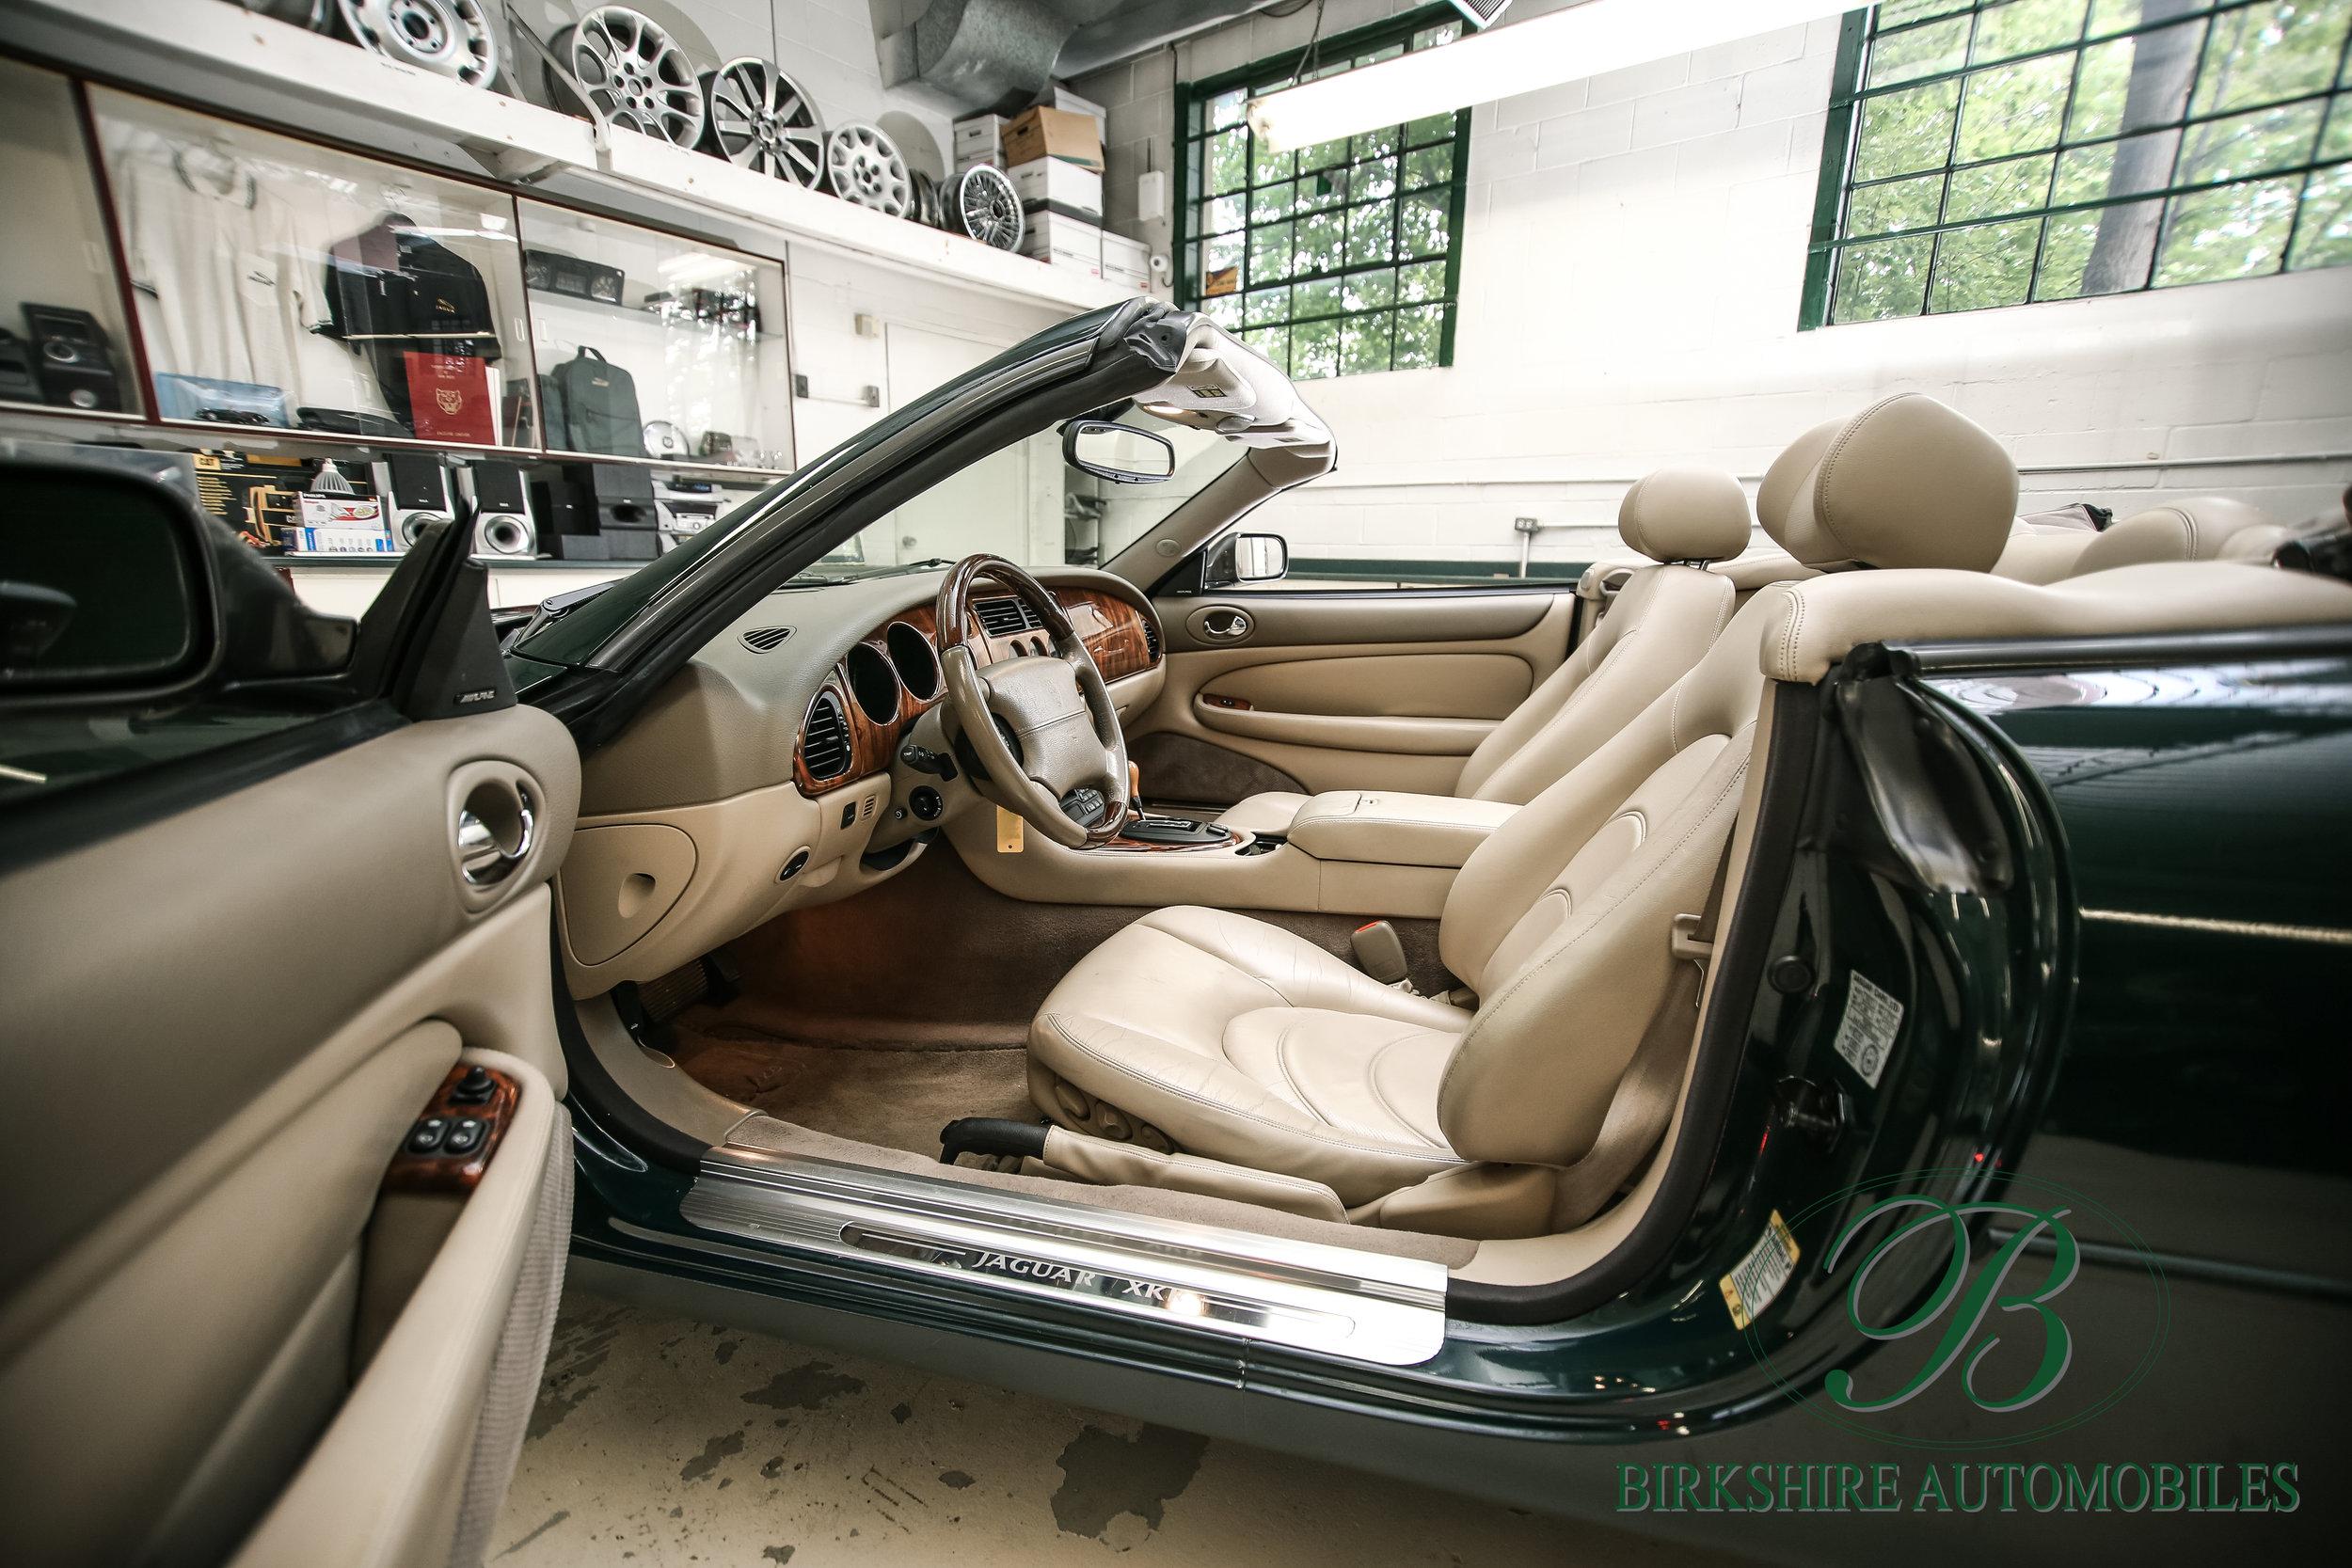 Birkshire Automobiles-139.jpg